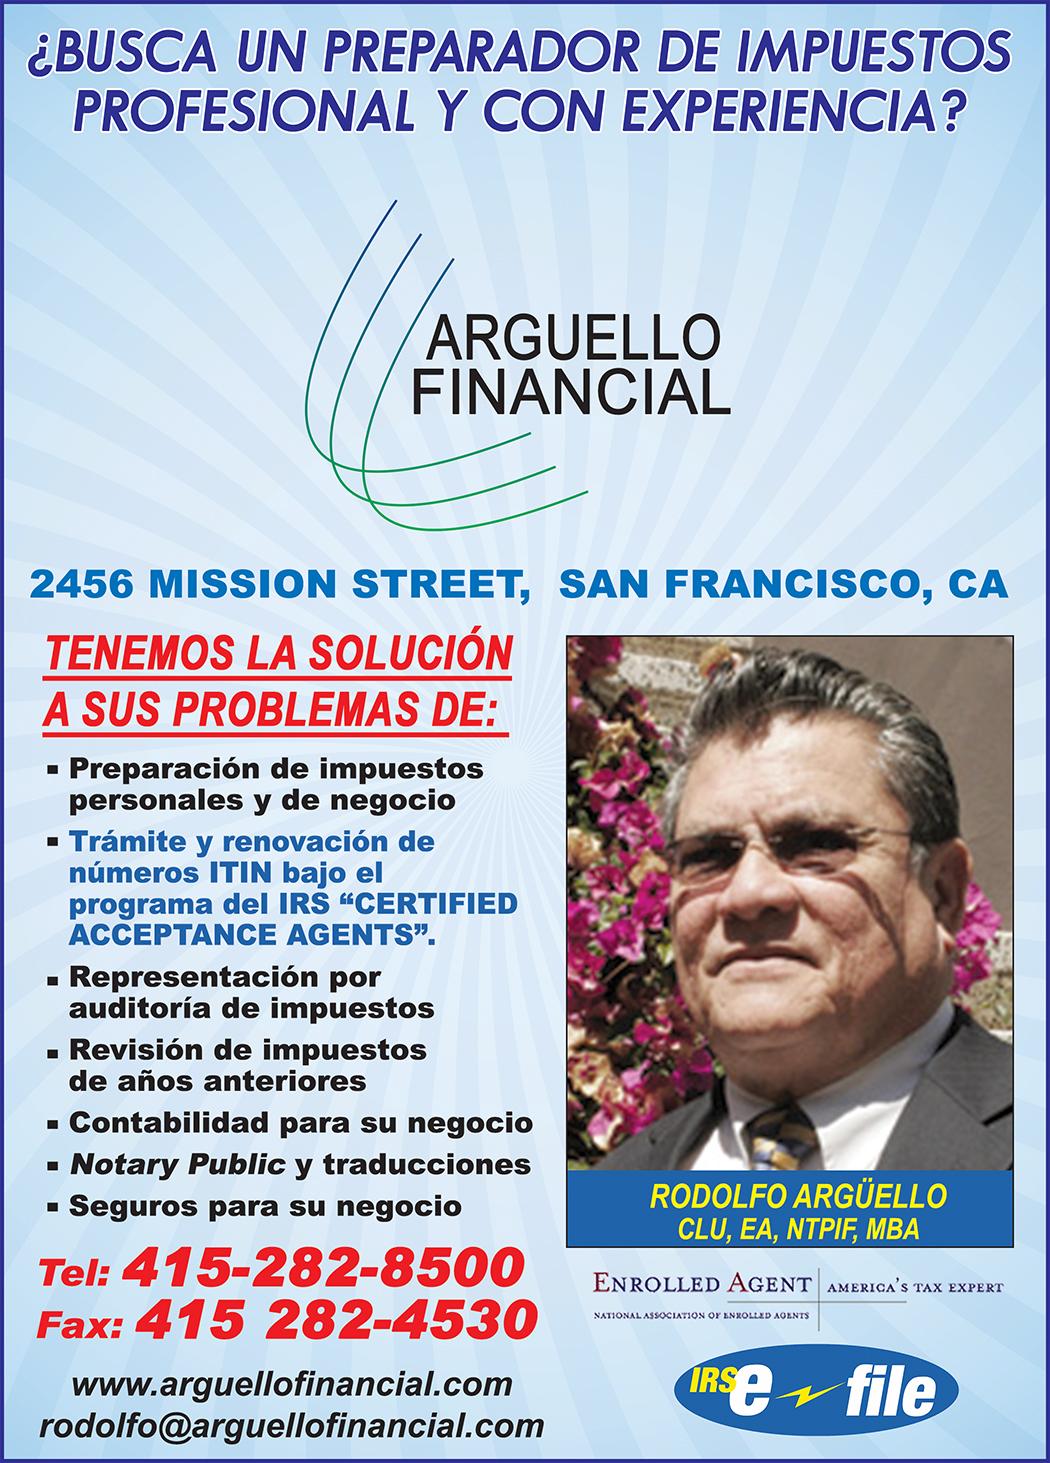 Arguello Financial 1 pag - ENERO 2018.jpg